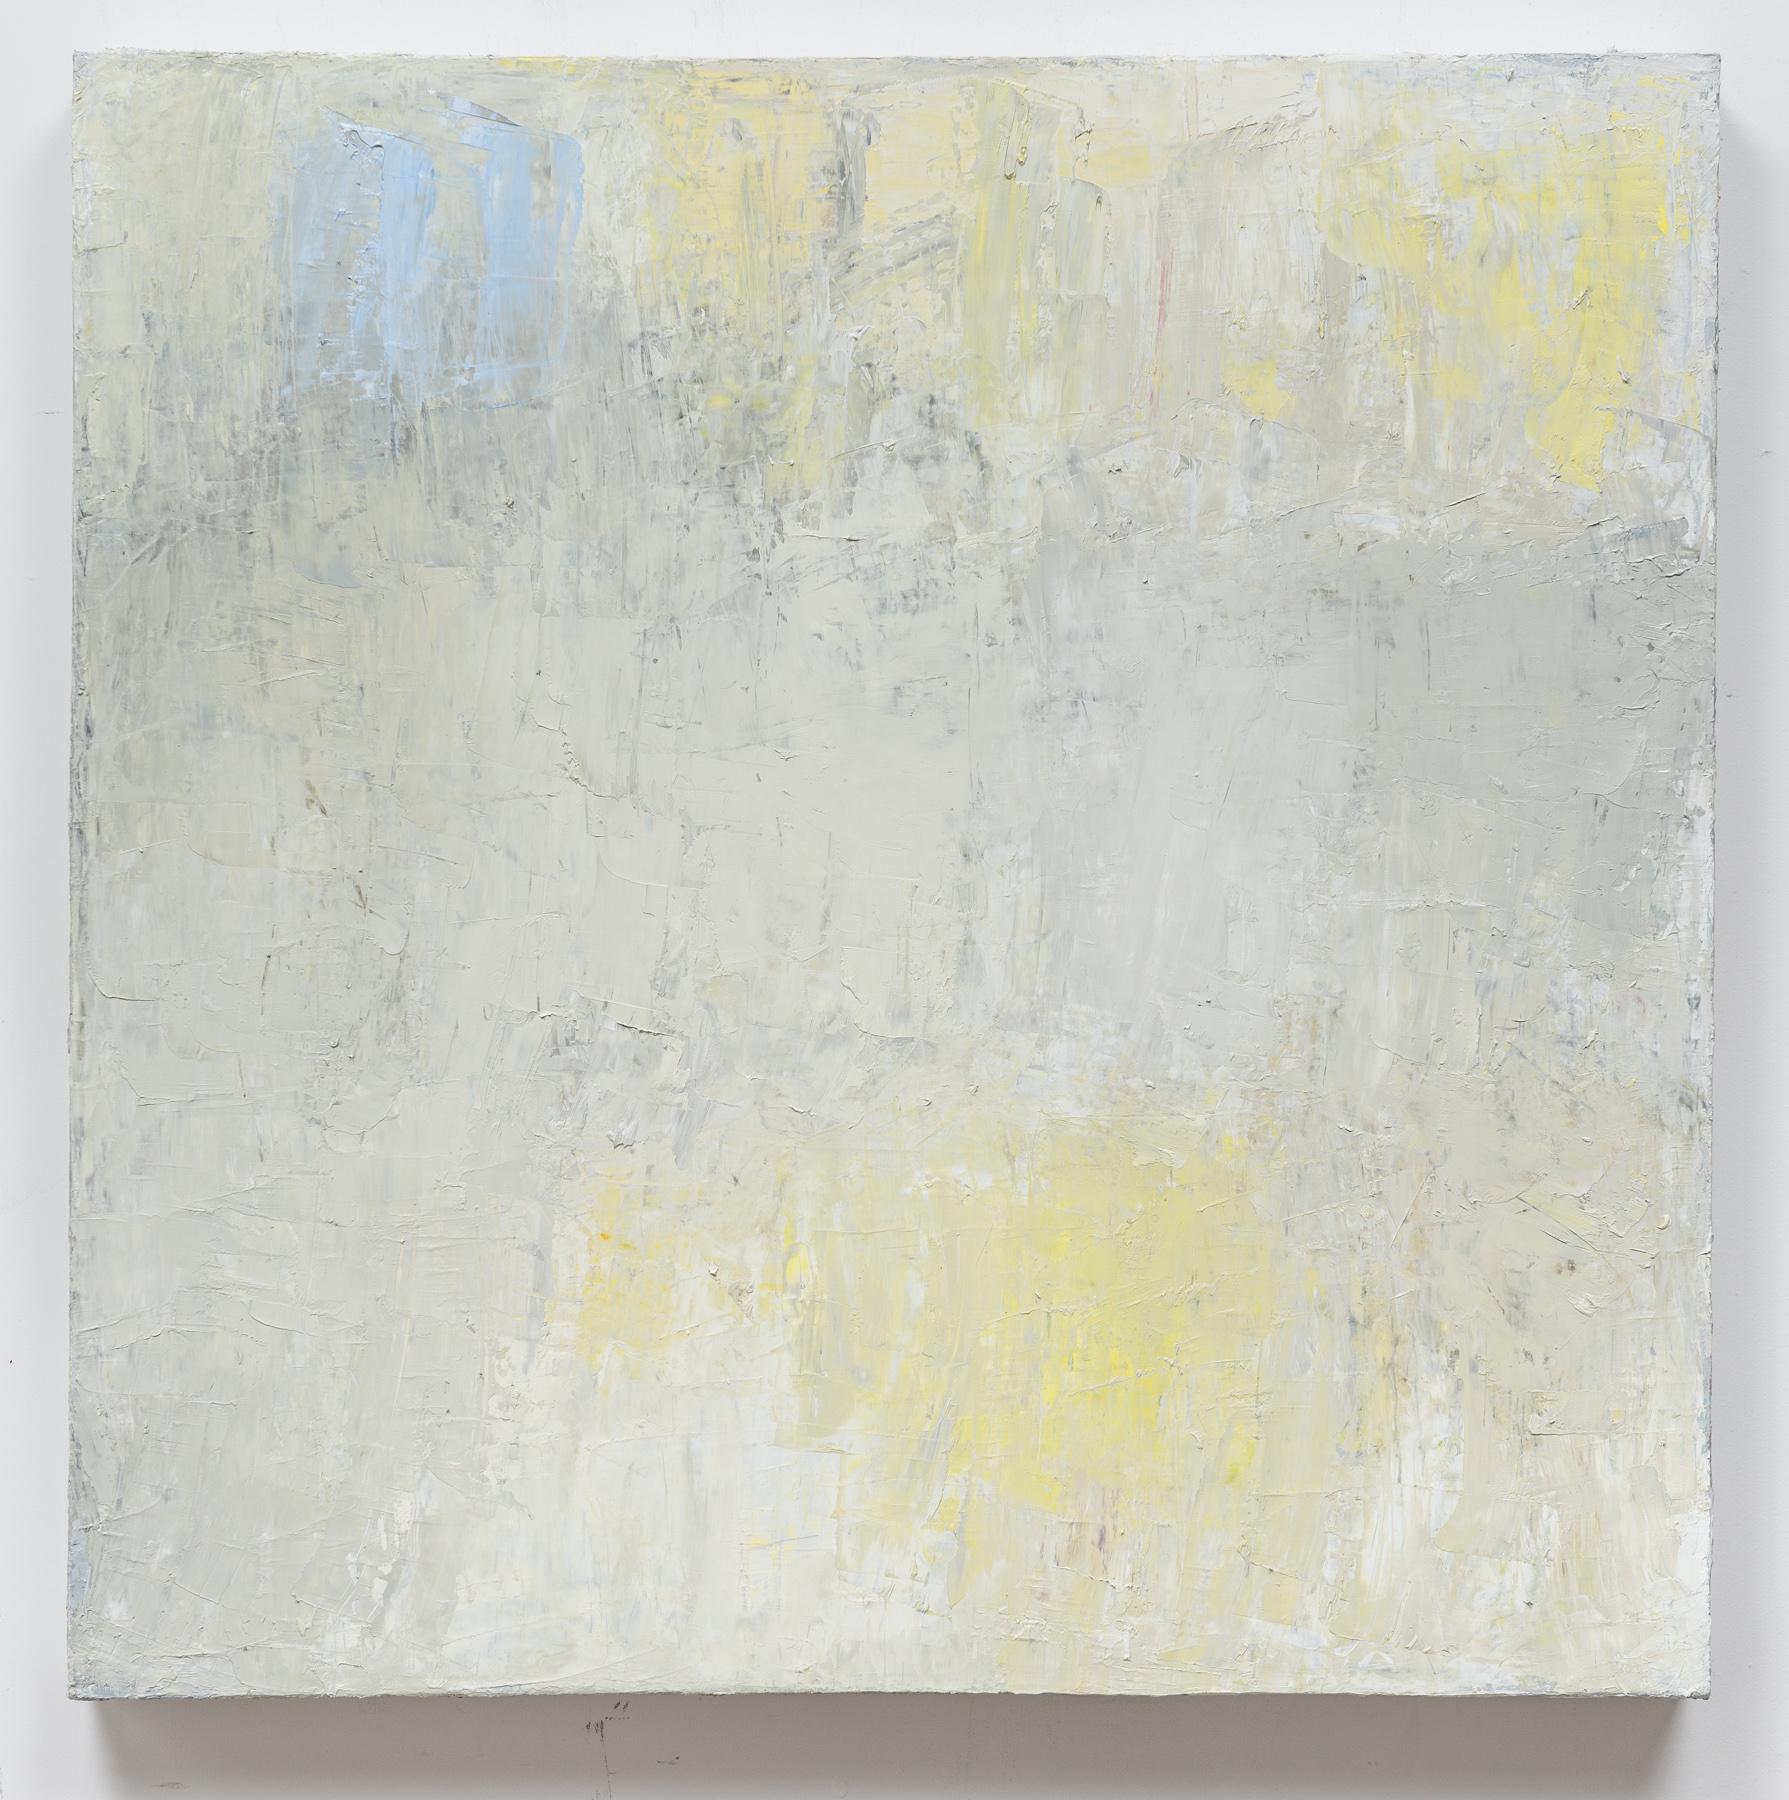 Untitled (yellow/light blue)